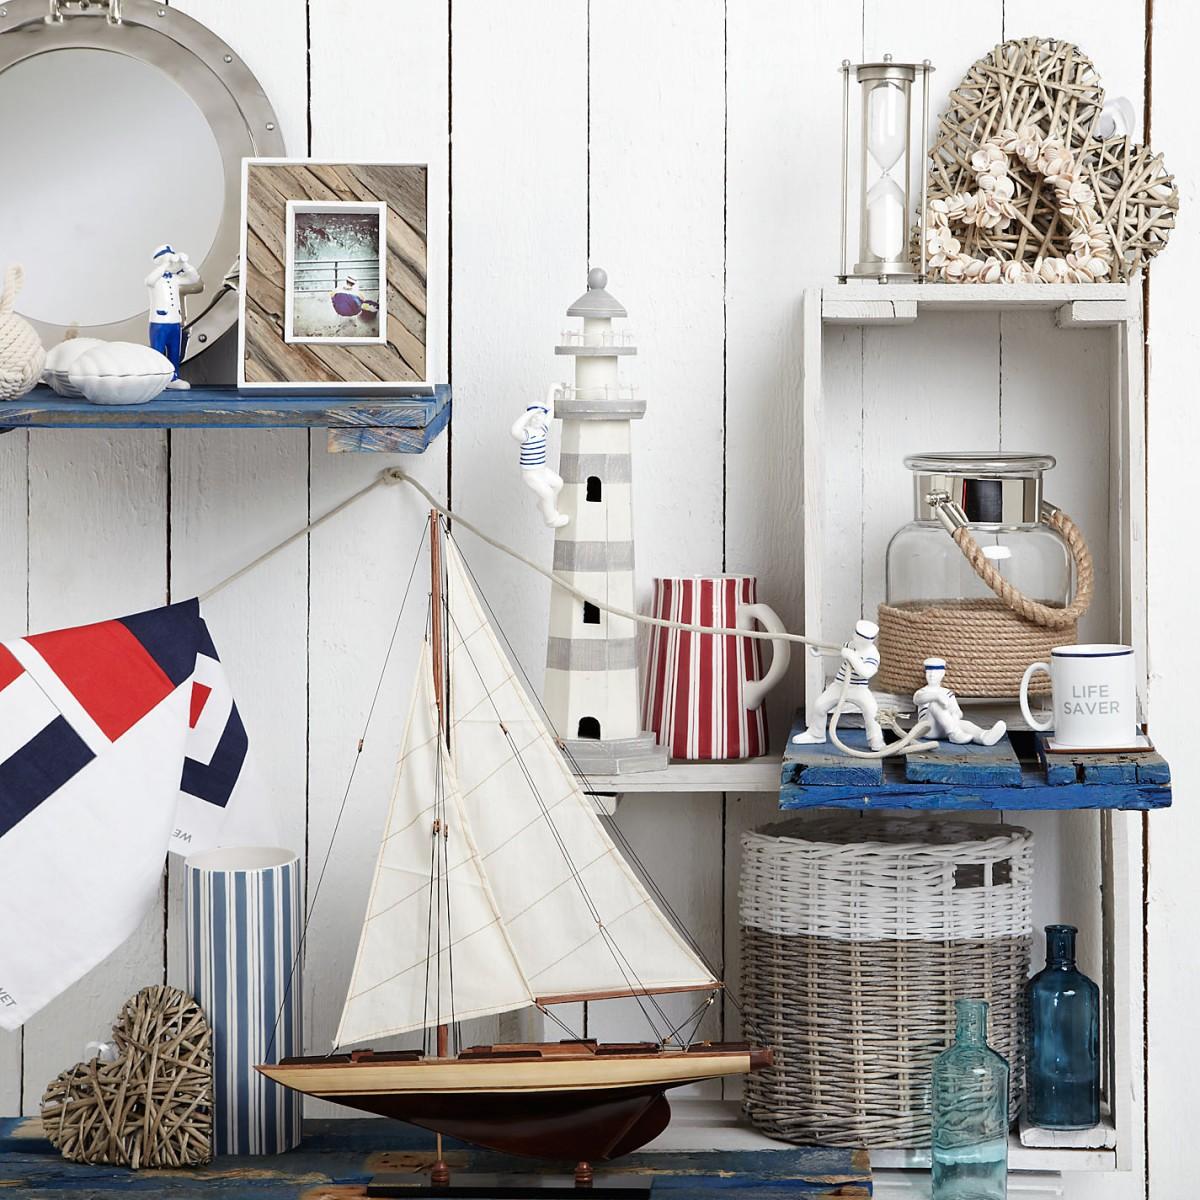 Nautical themed bathroom – Bathroom Knick Knacks